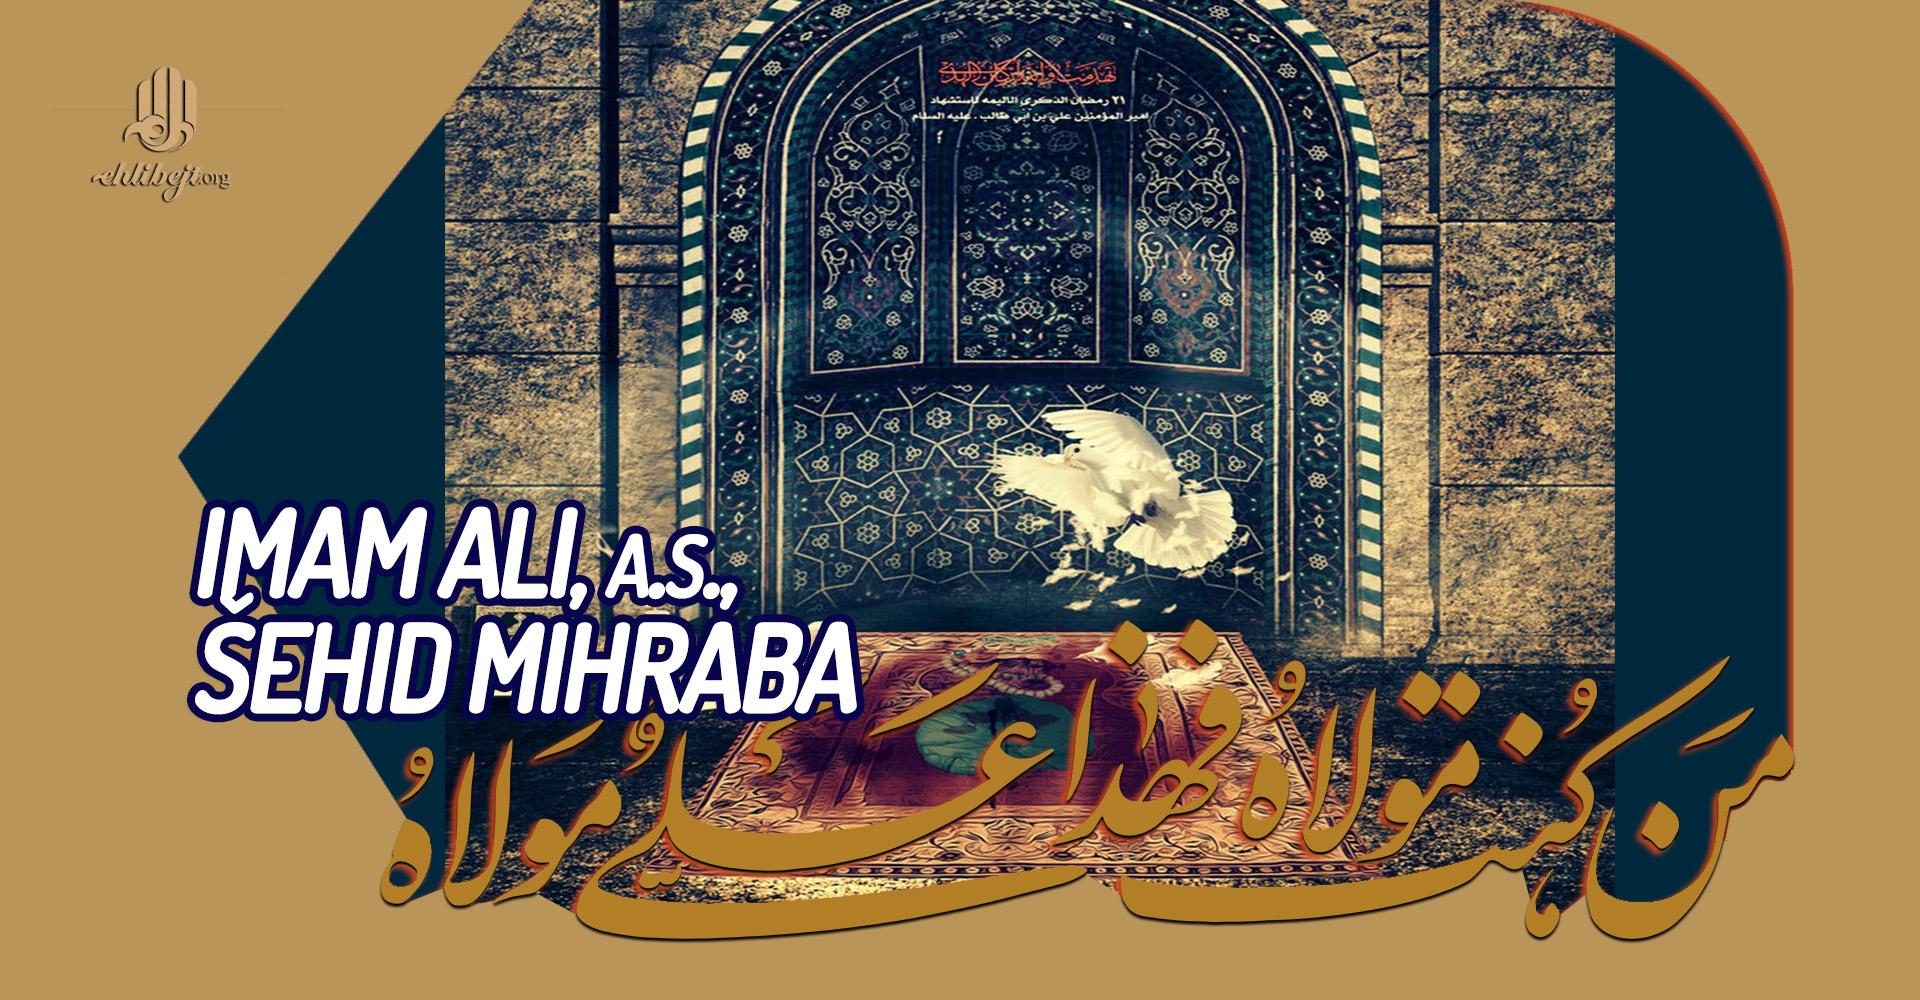 Imam Ali, a.s., šehid mihraba